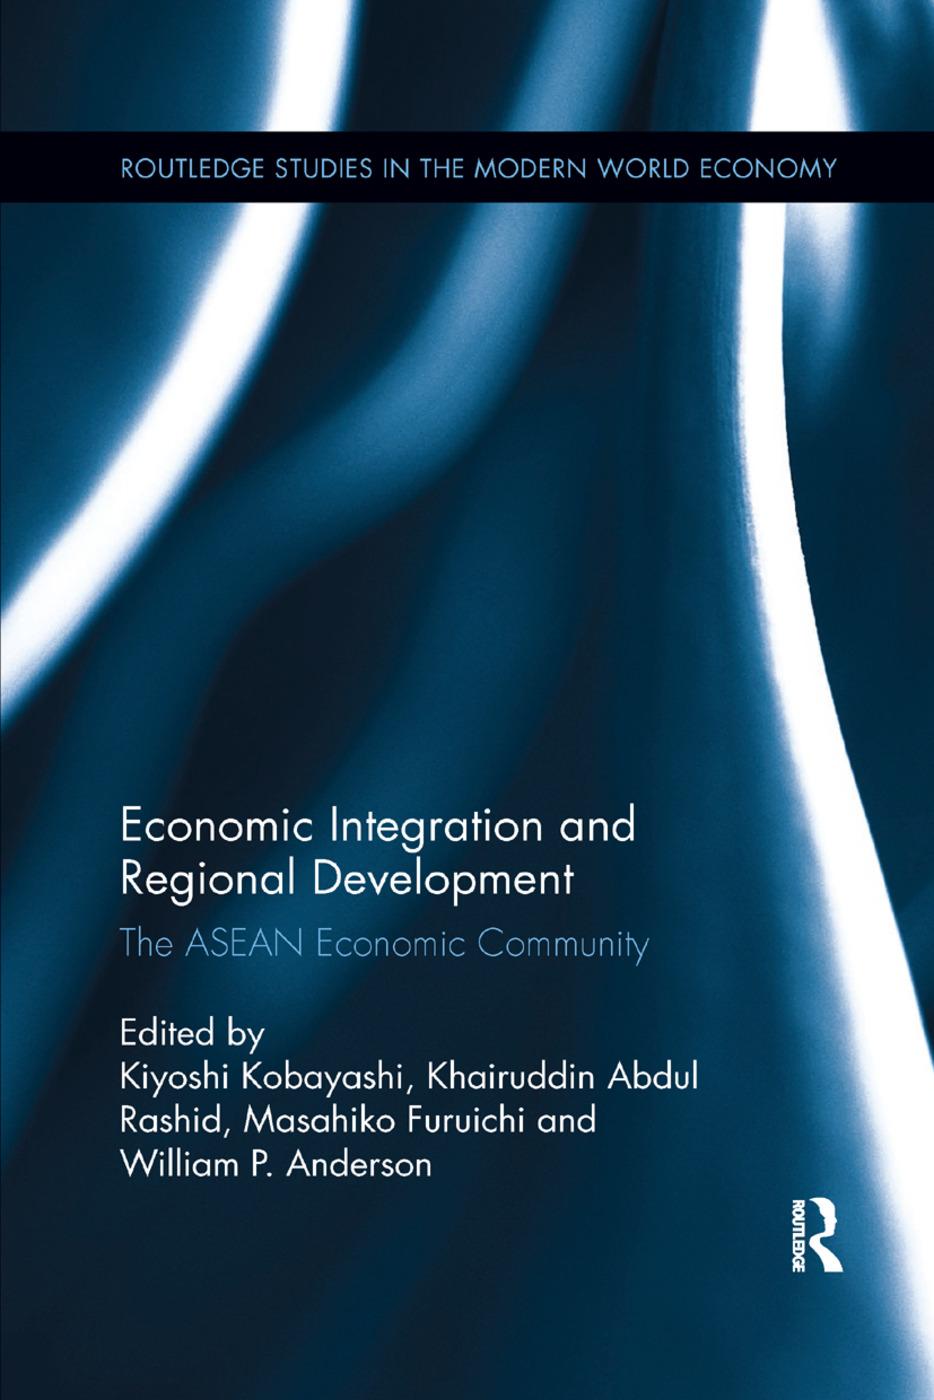 Economic Integration and Regional Development: The ASEAN Economic Community, 1st Edition (Paperback) book cover